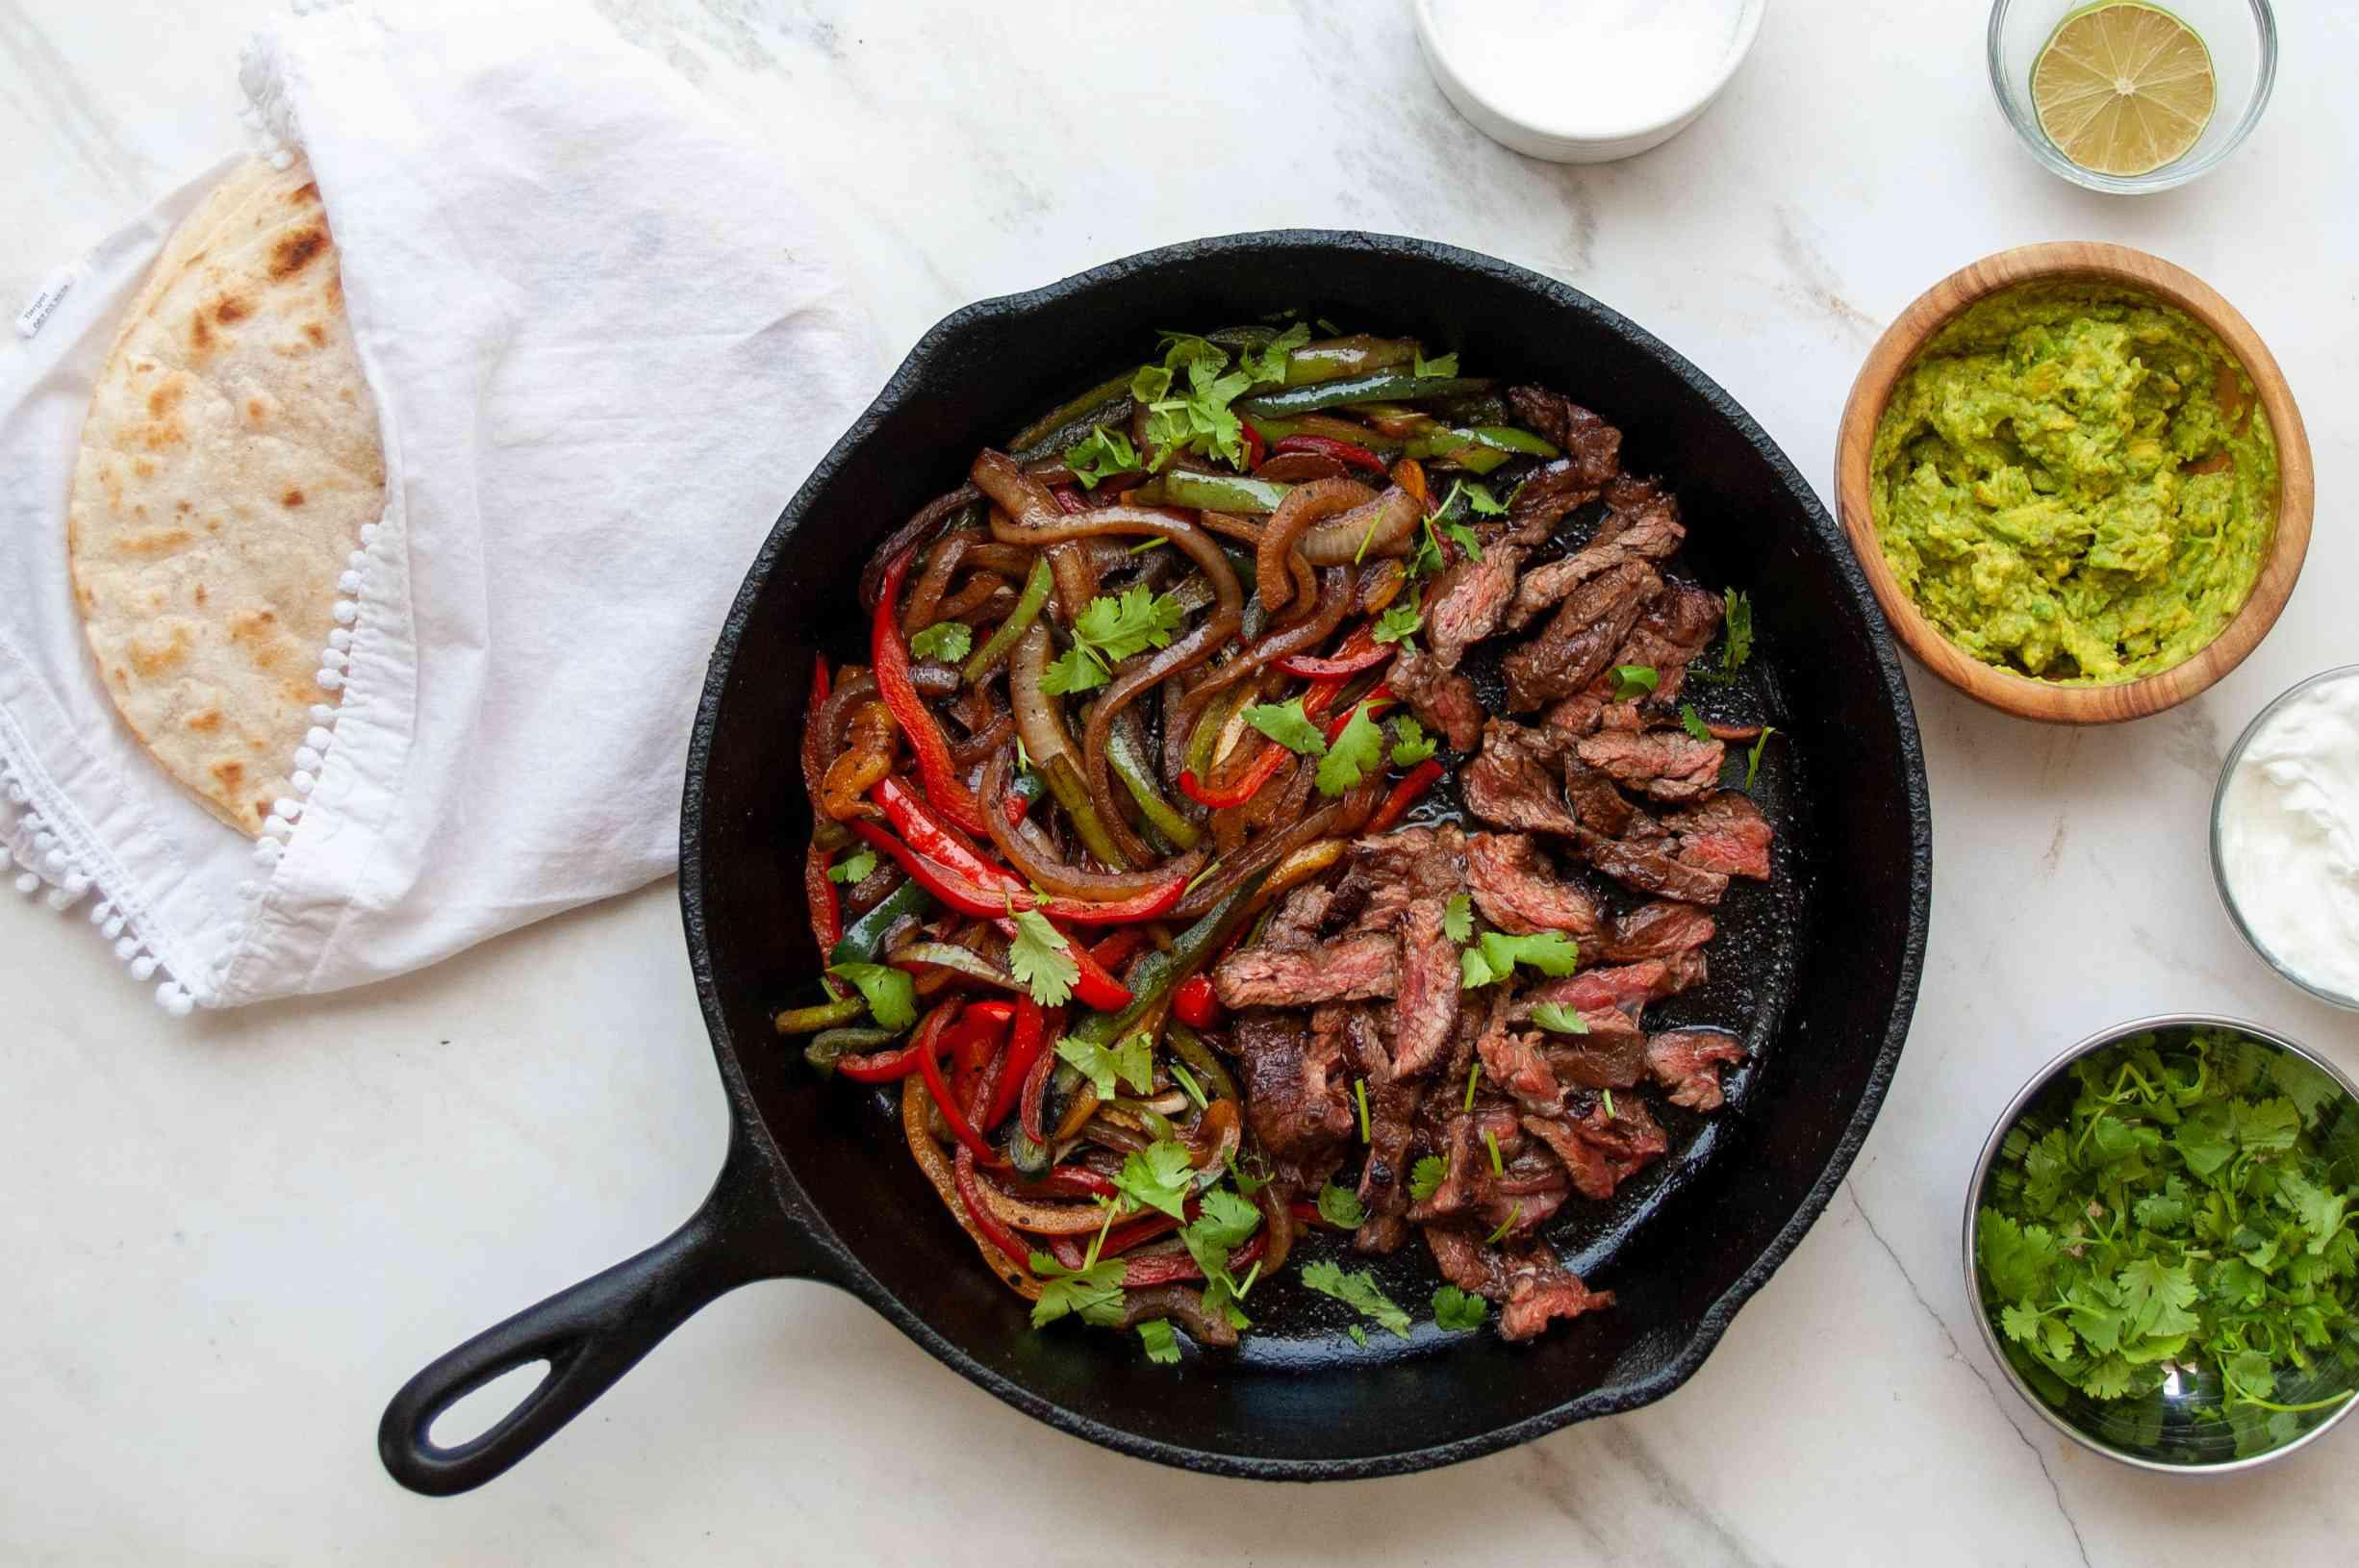 steak fajitas with accoutrements